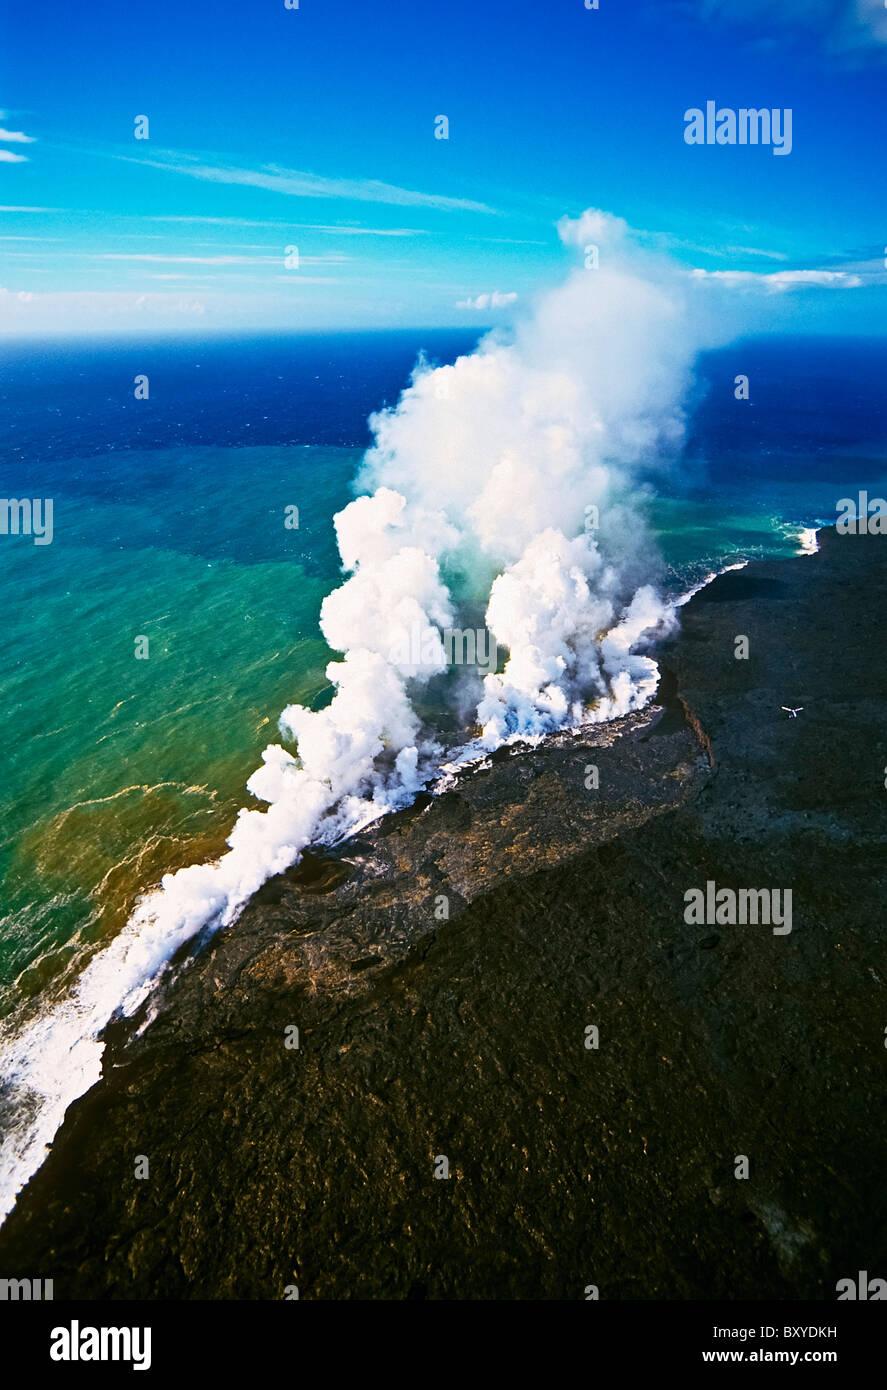 Di lava fusa entra freddo Oceano, vulcano Kilauea, Big Island, Hawaii, STATI UNITI D'AMERICA Foto Stock